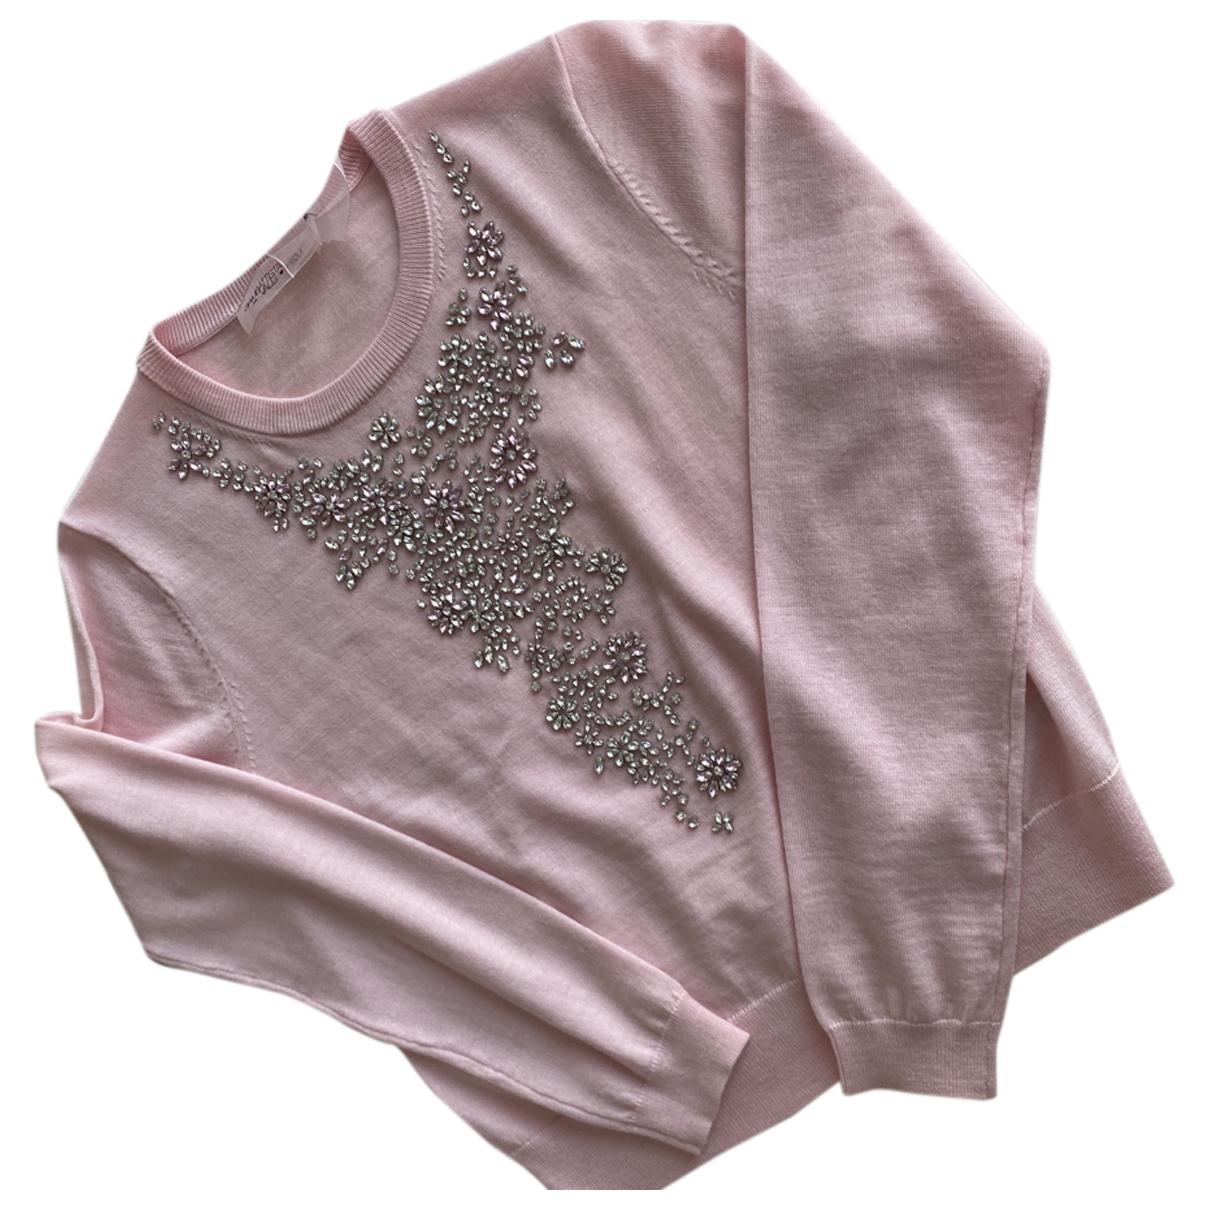 Giambattista Valli X H&m - Pull   pour femme en laine - rose